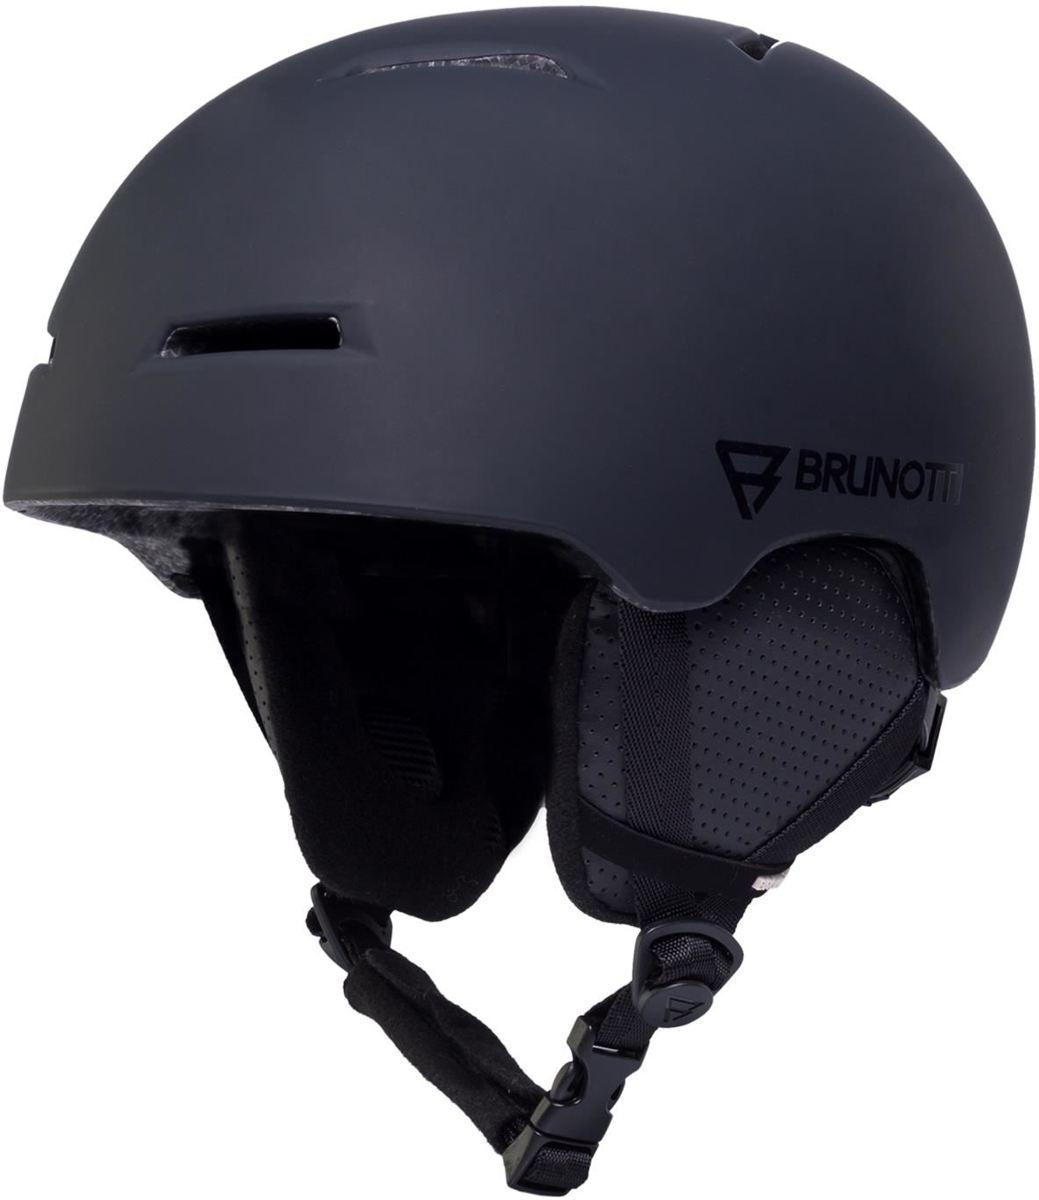 Brunotti Maddox - Skihelm - Unisex - Maat 59/61 - Black kopen